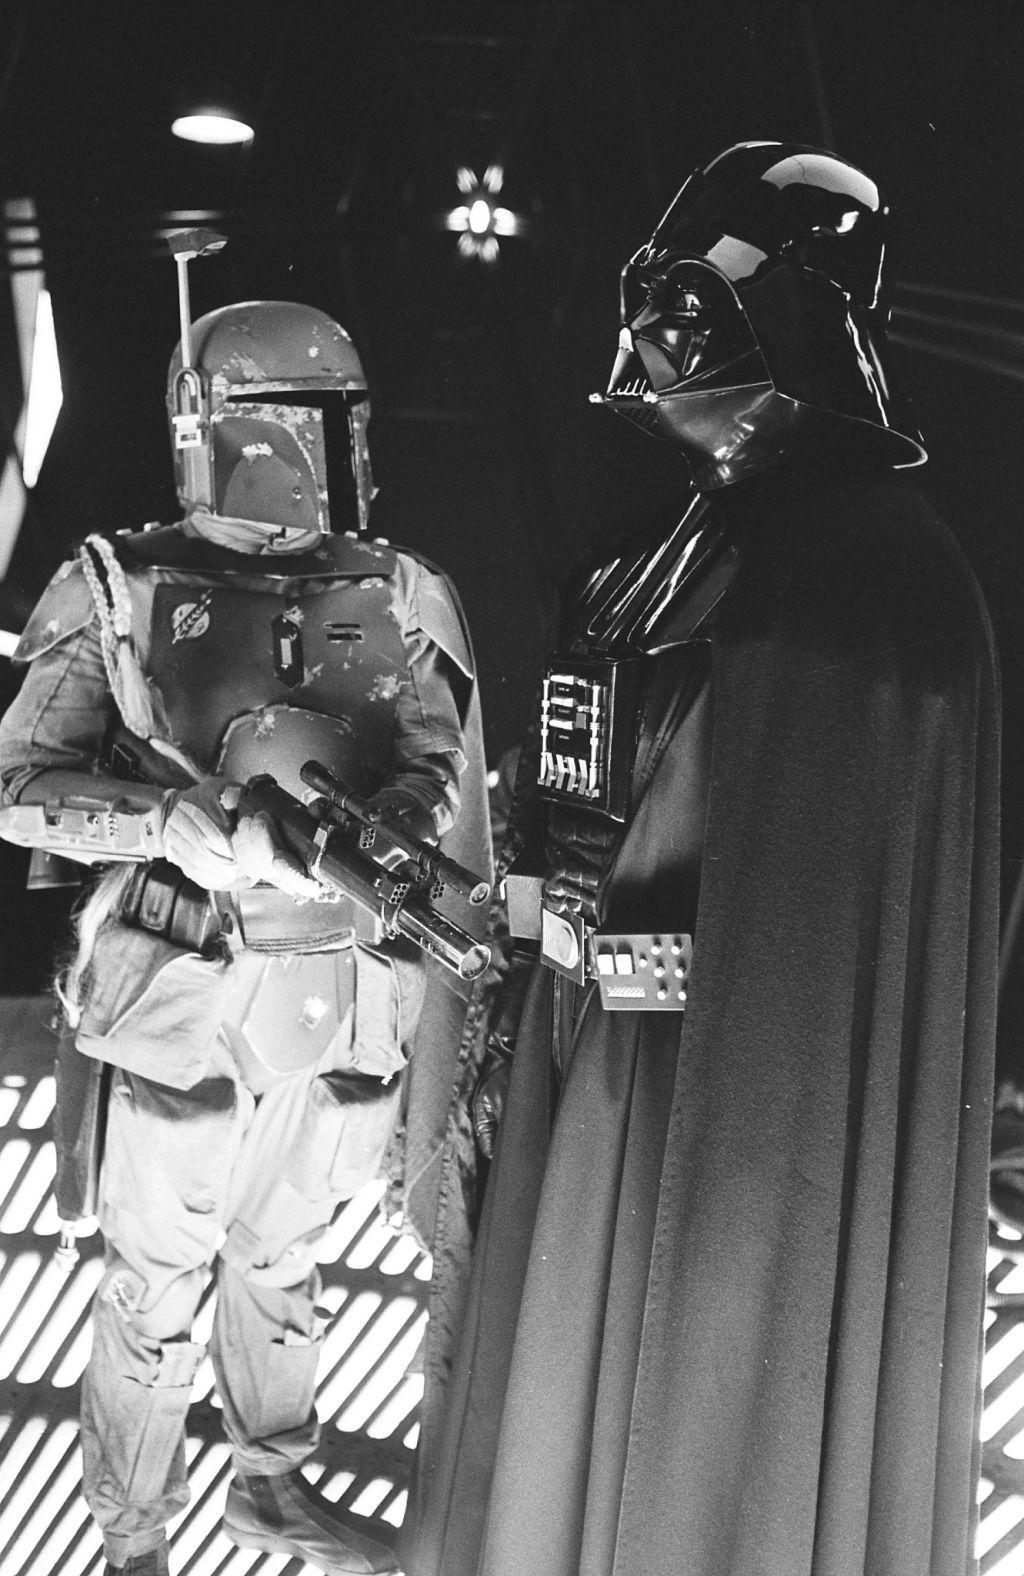 Star Wars on Twitter